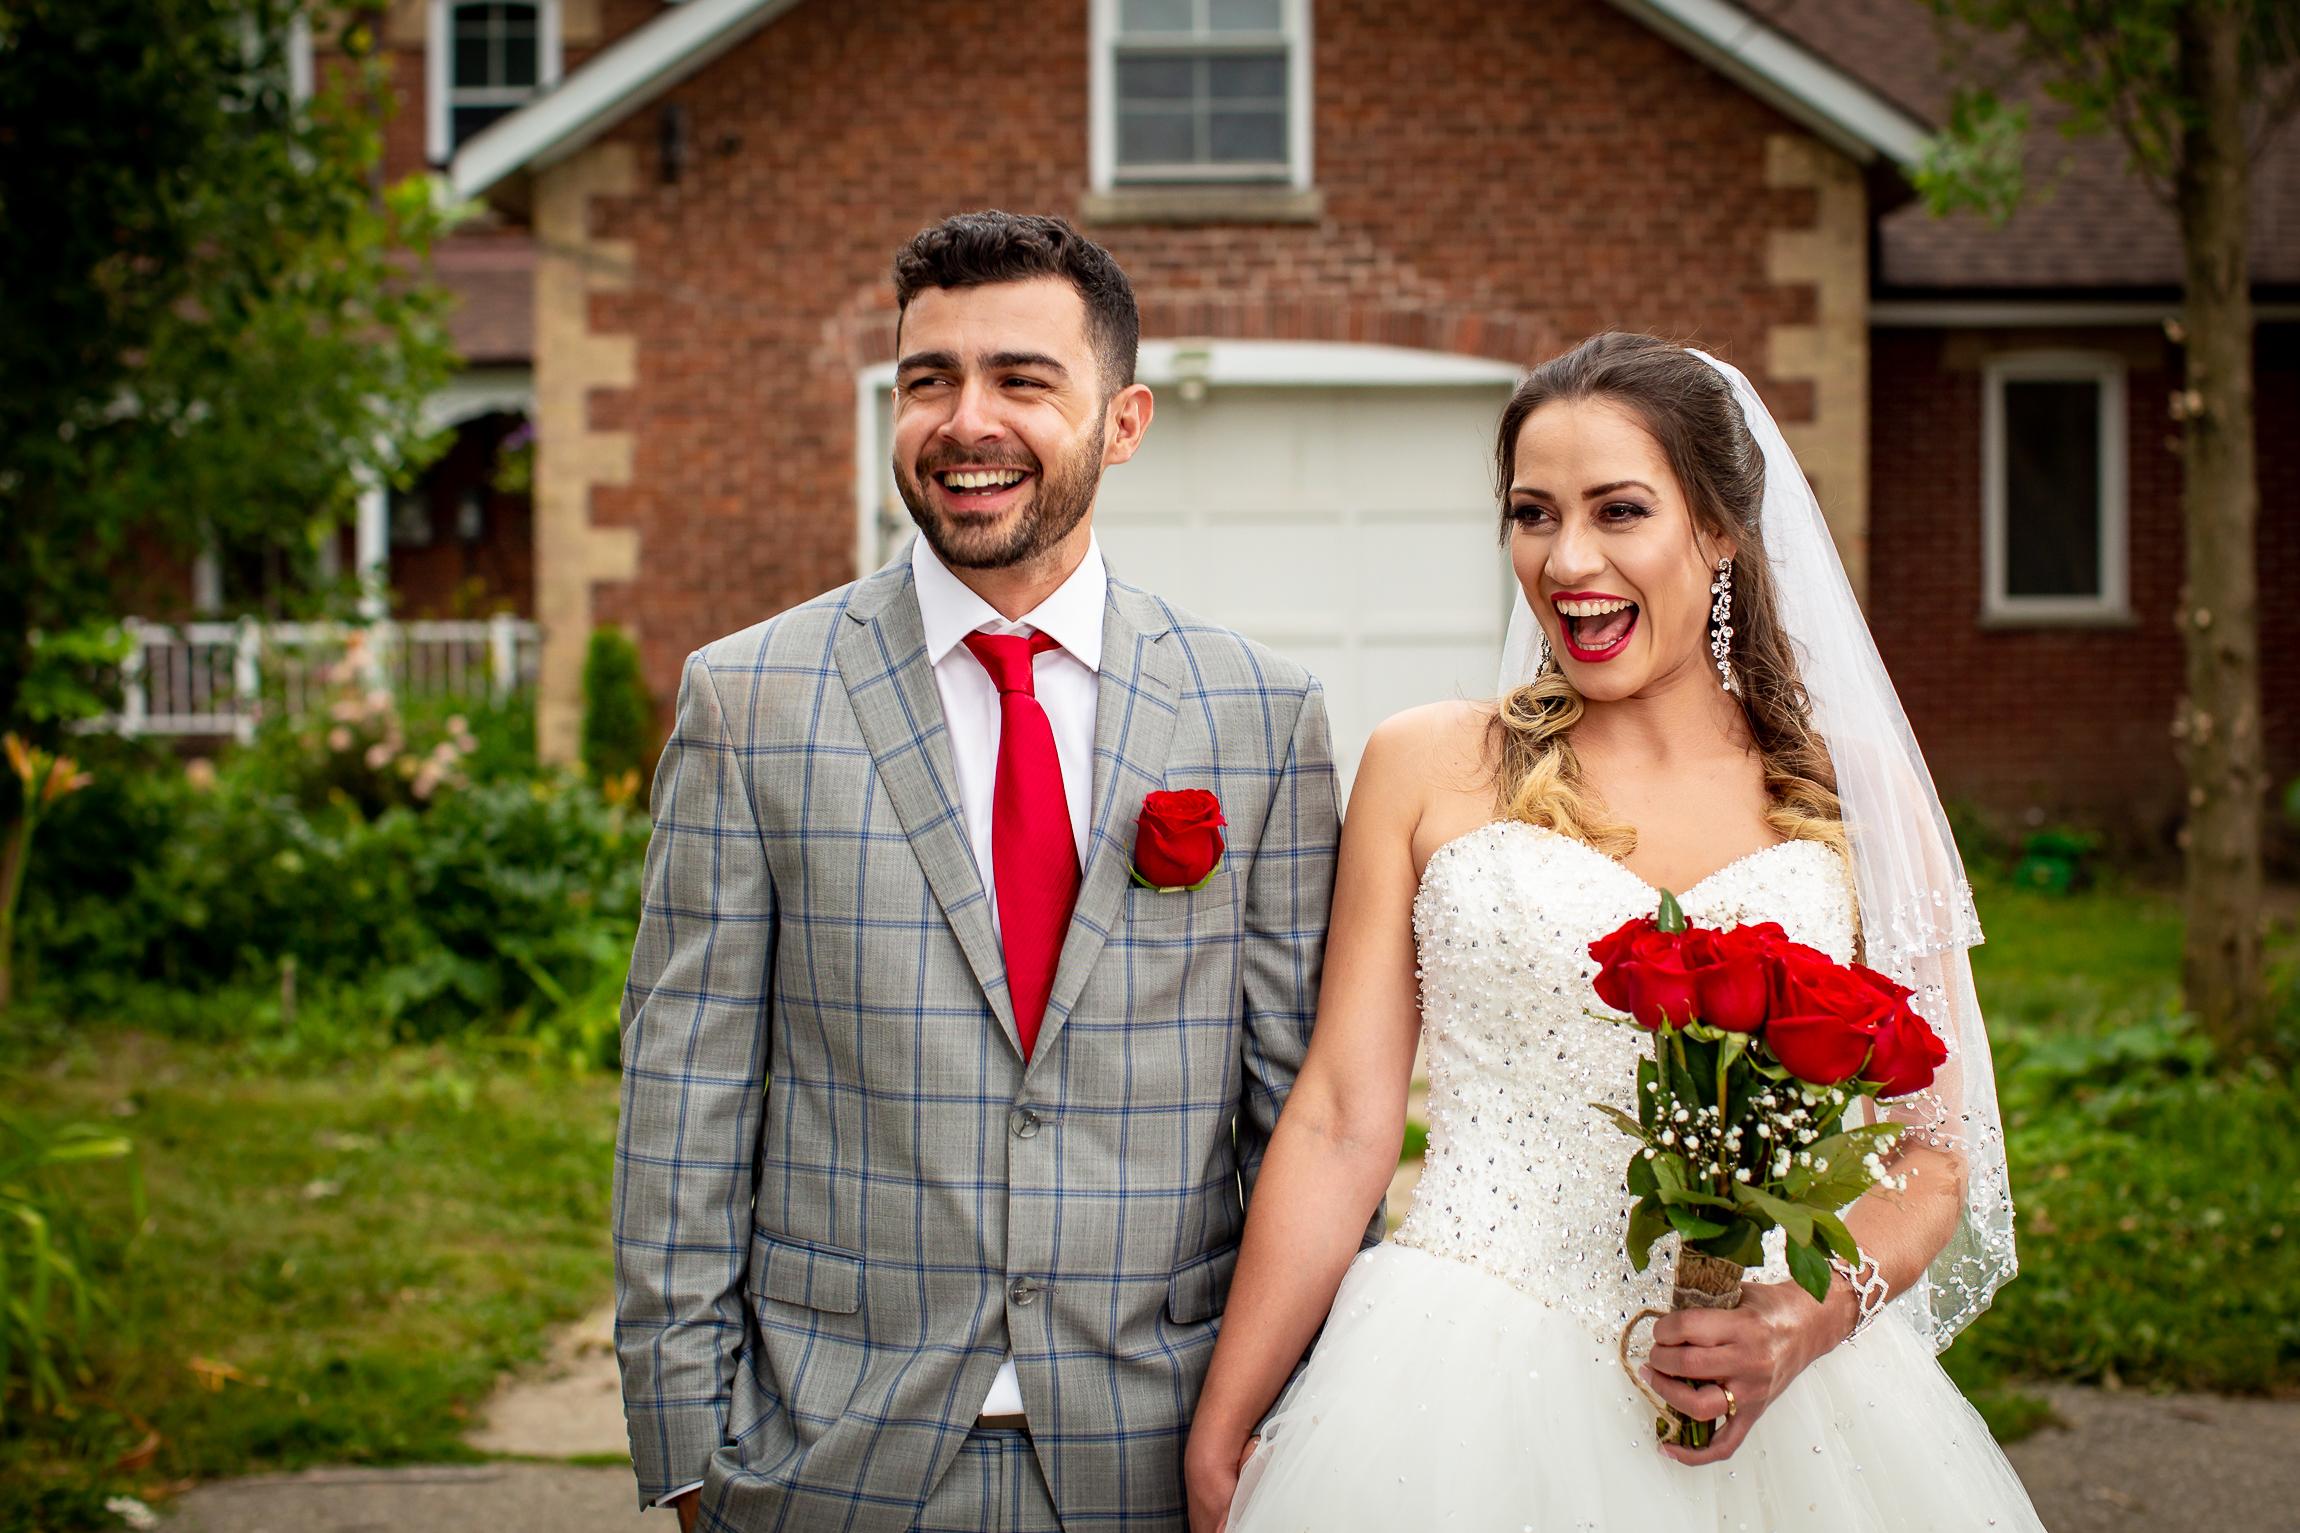 Toronto-wedding-Photograper-100.jpg